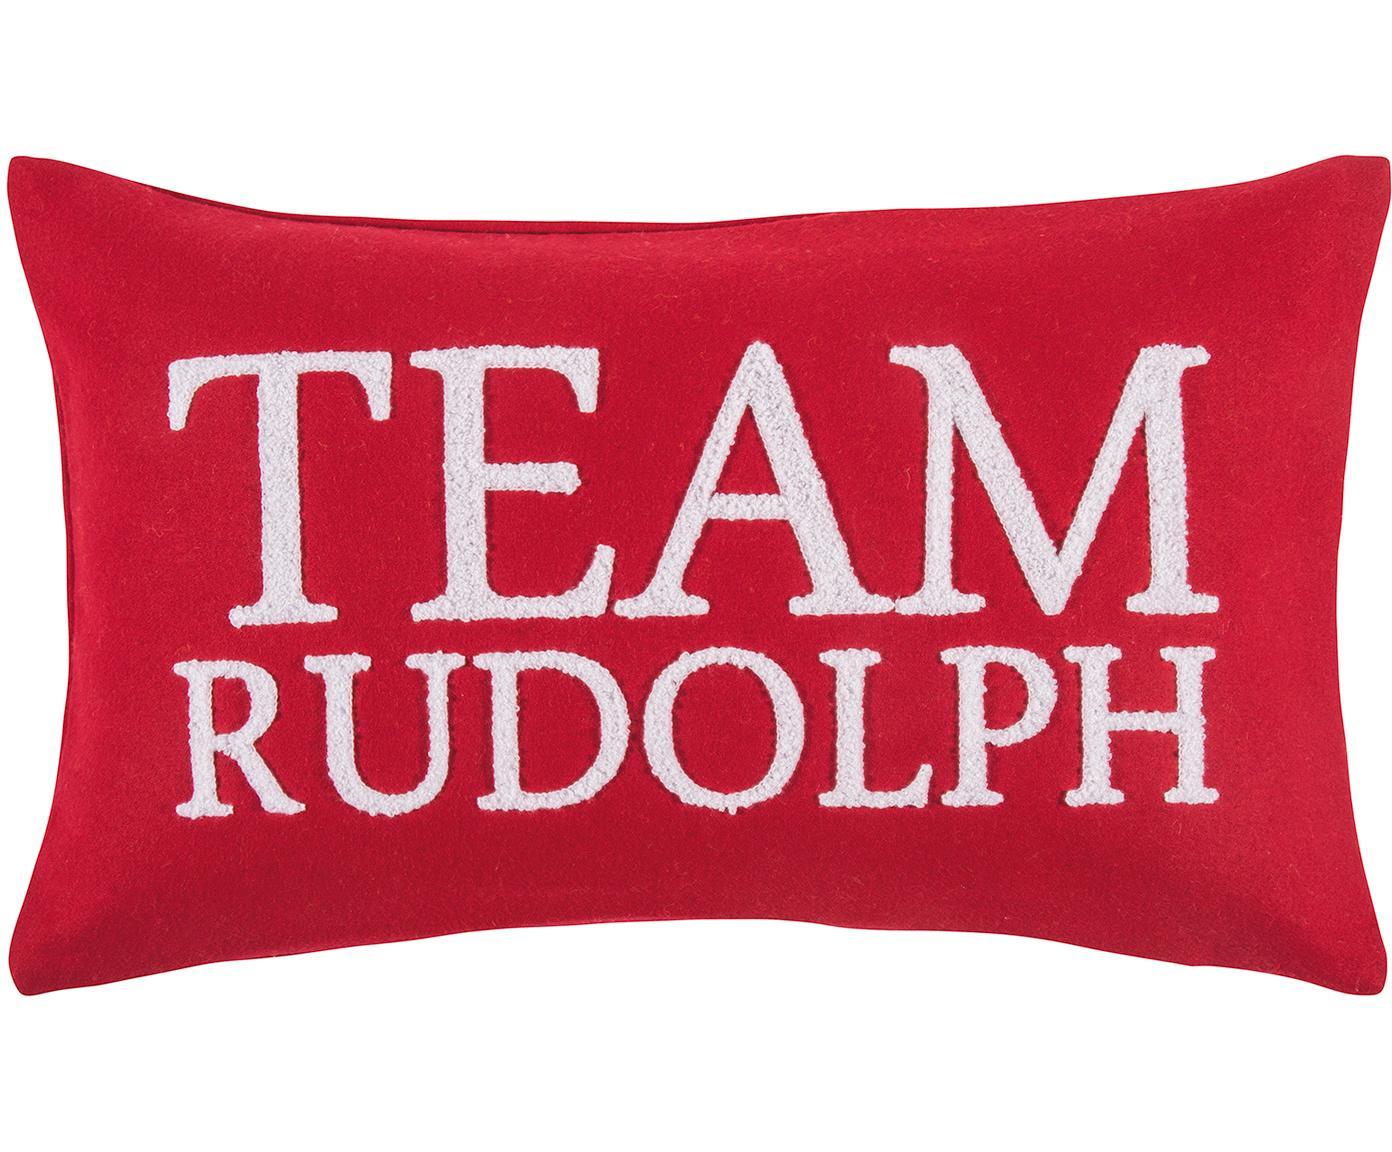 Federa arredo Rudolph, 60% lana, 40% poliestere, Rosso, bianco, Larg. 30 x Lung. 50 cm